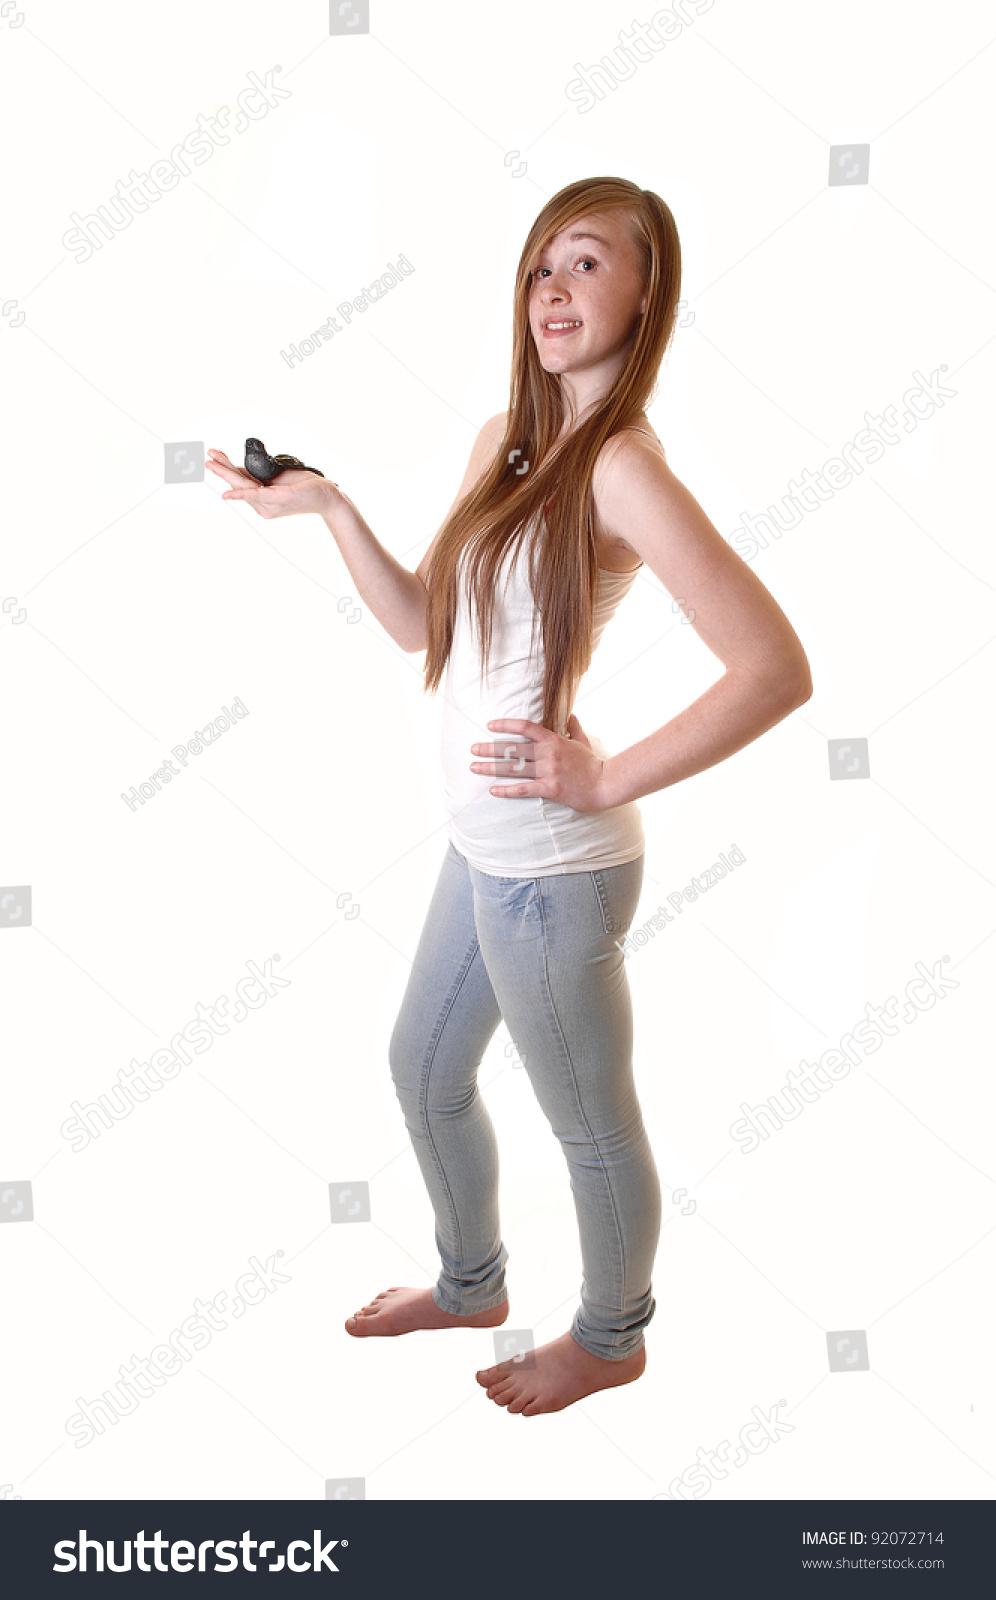 Milf strapon lesbian thumbs